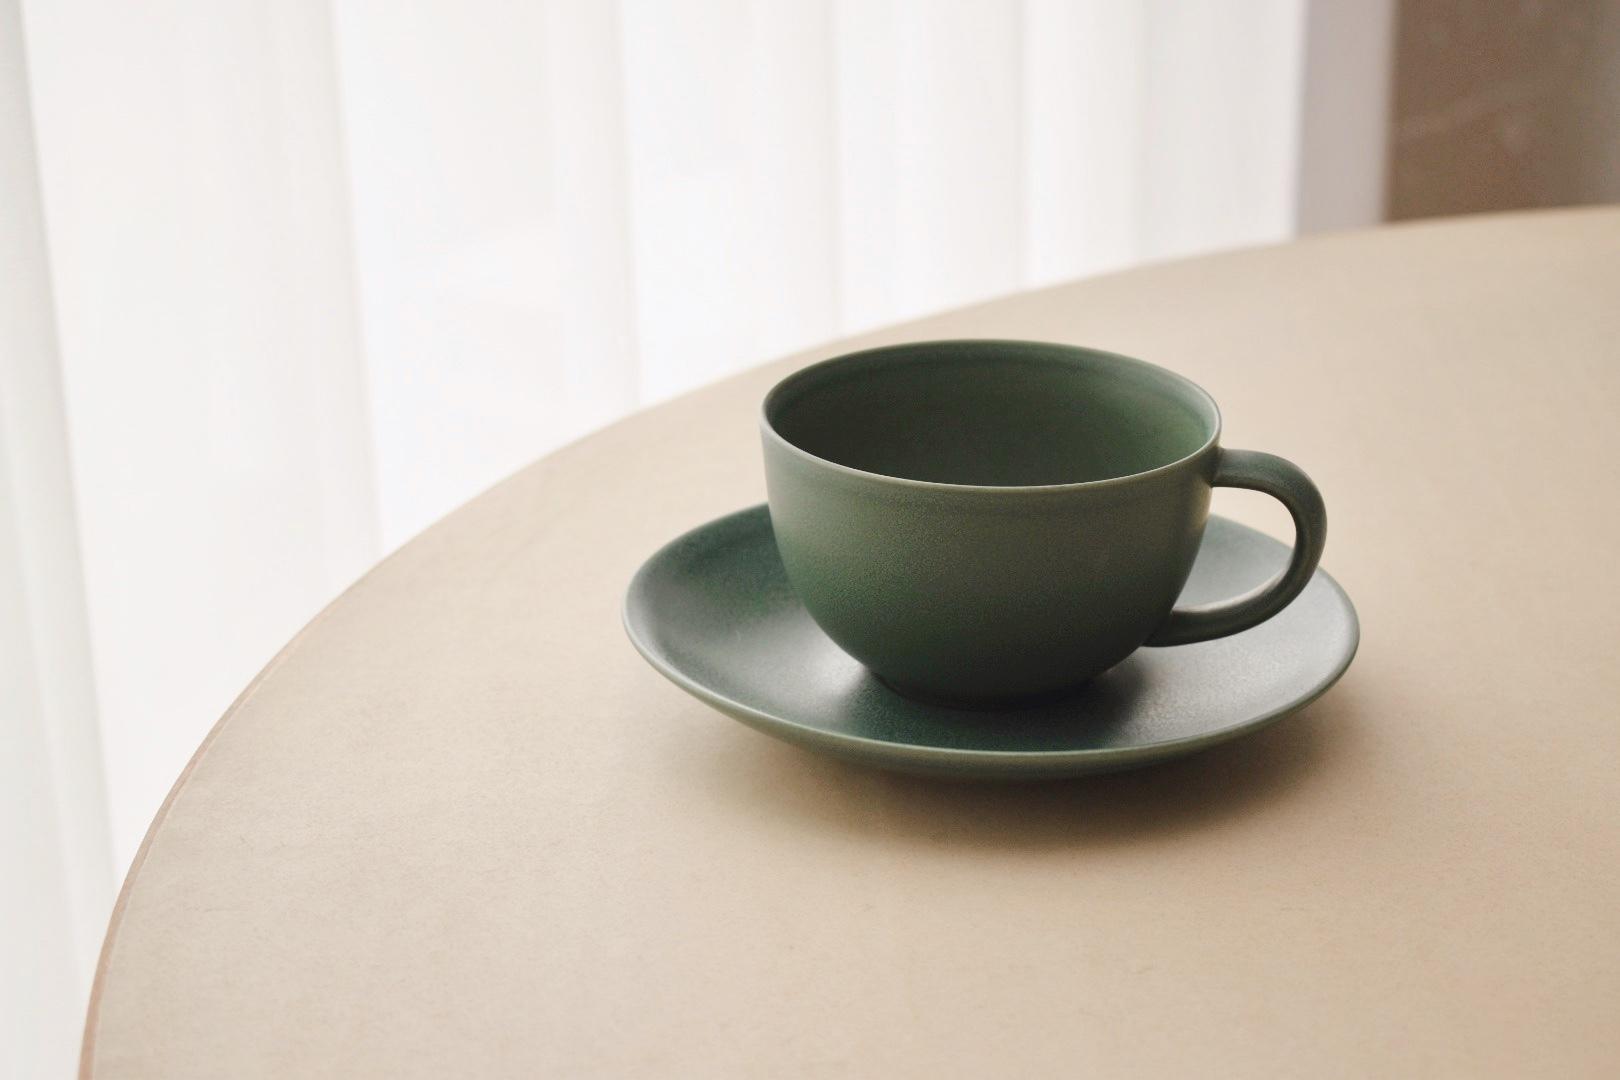 arabia 24h tea c&s(Heikki Orvola)